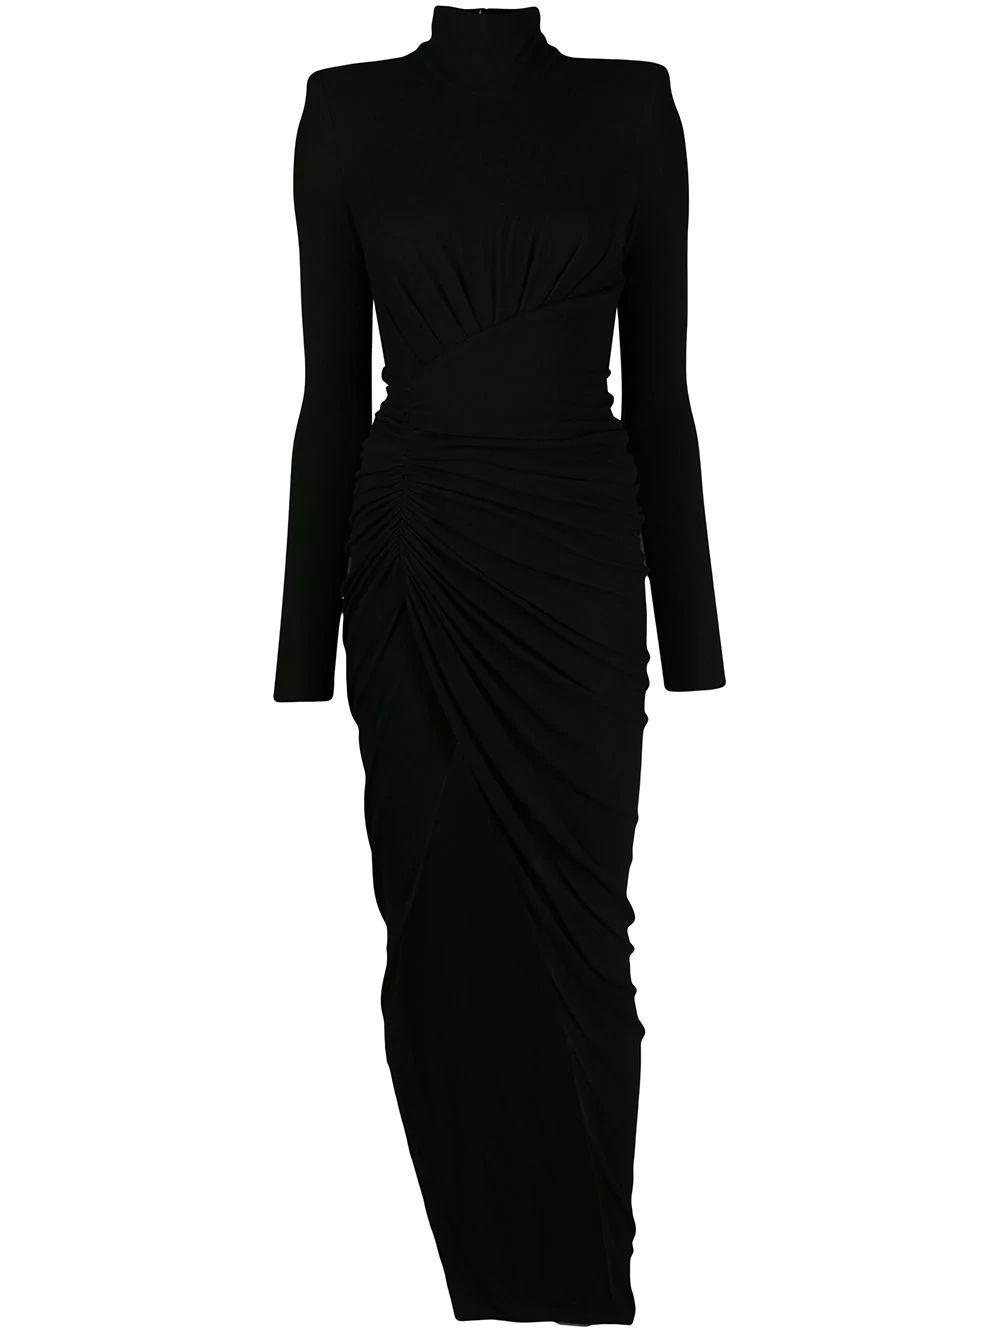 Turtle Neck Long Dress Item # 203DR1318